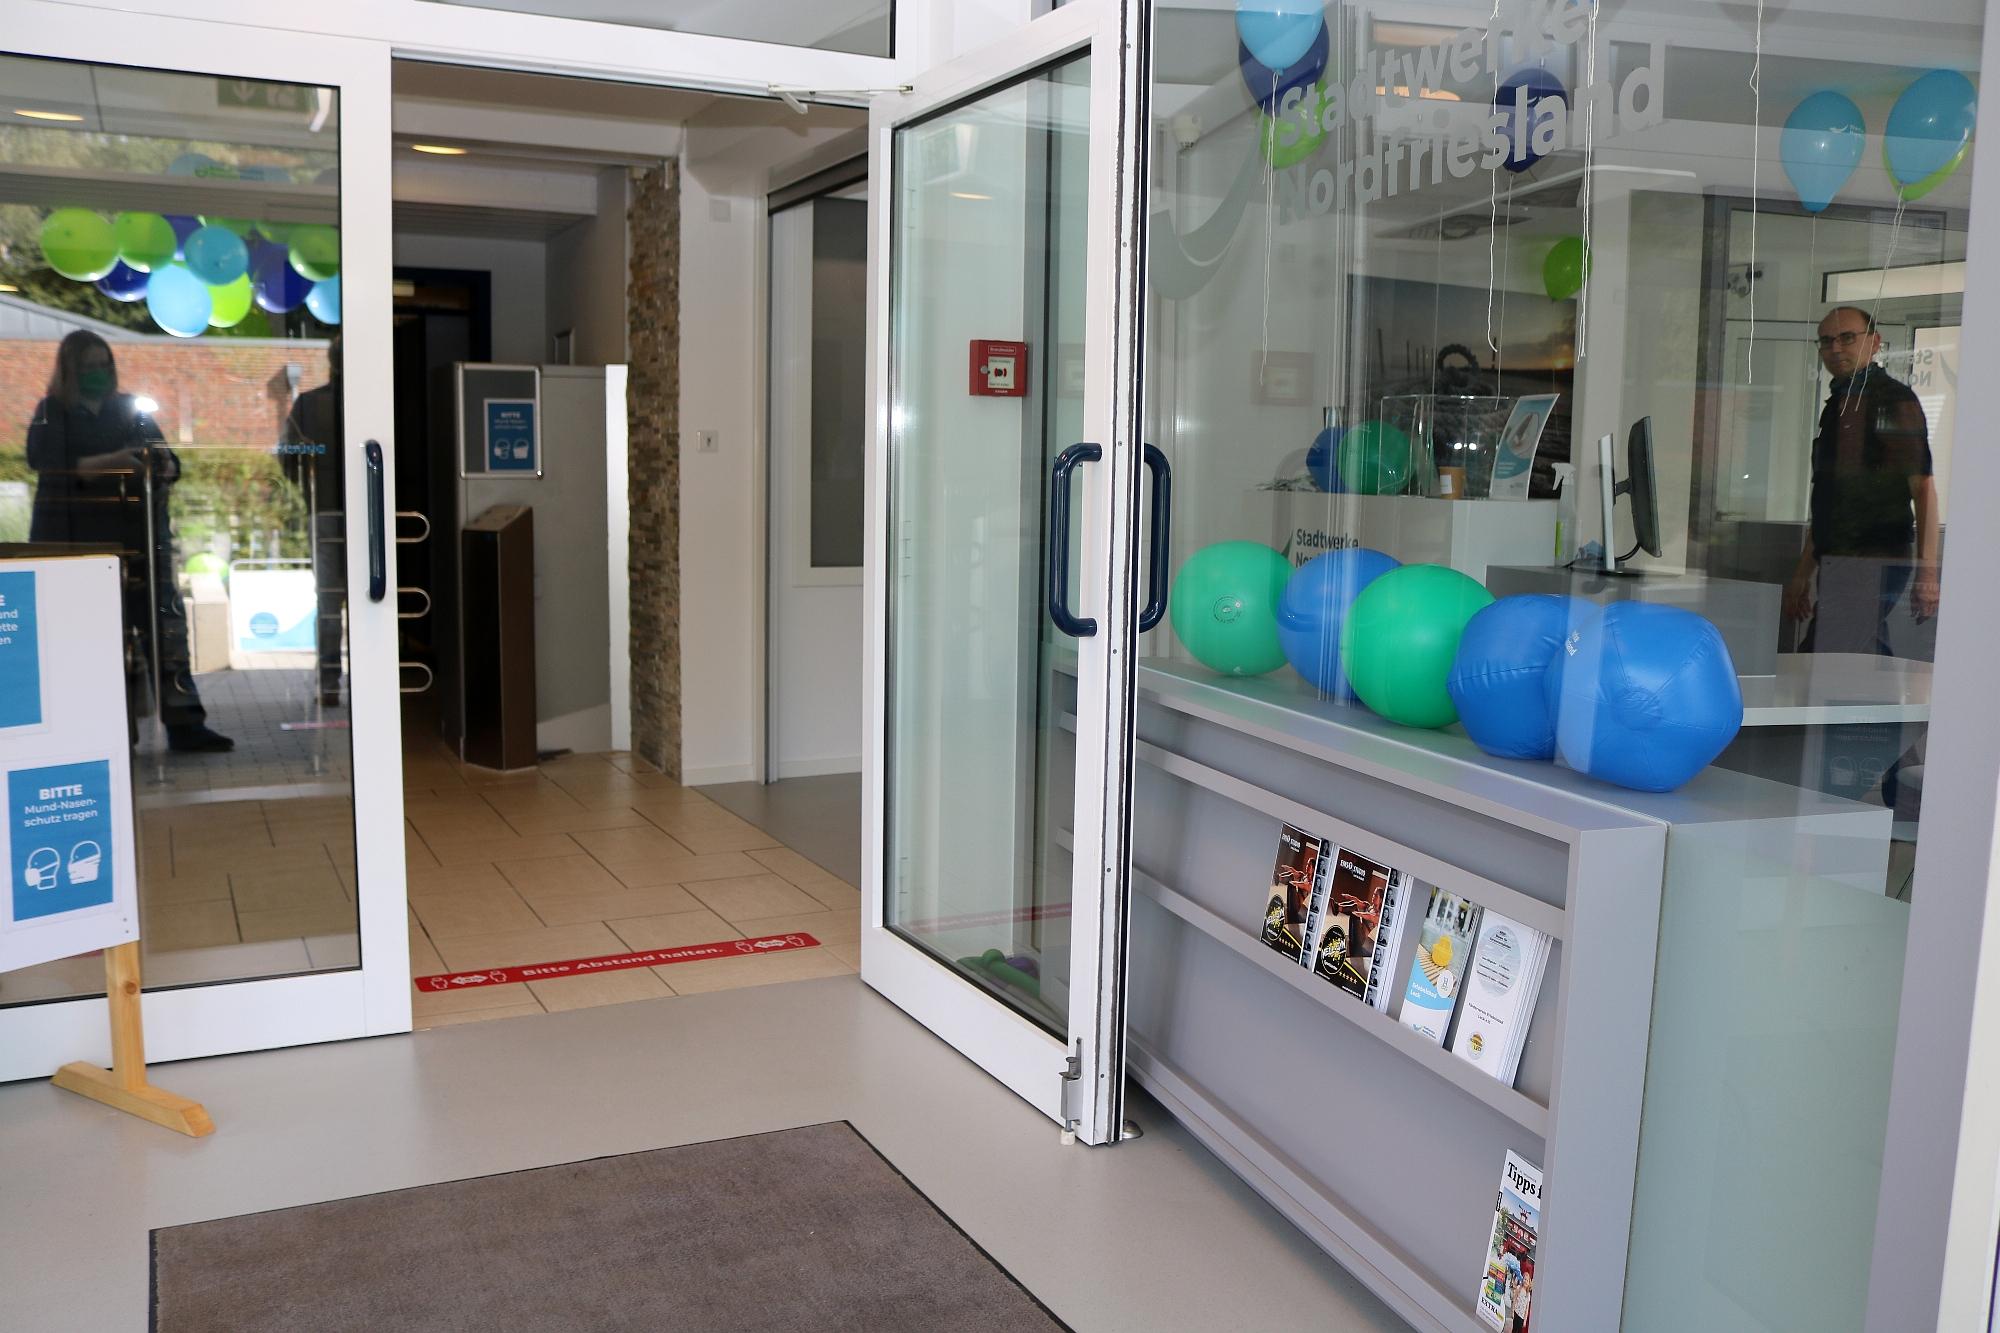 202009 Eröffnung Kundenbüro SWNF 4